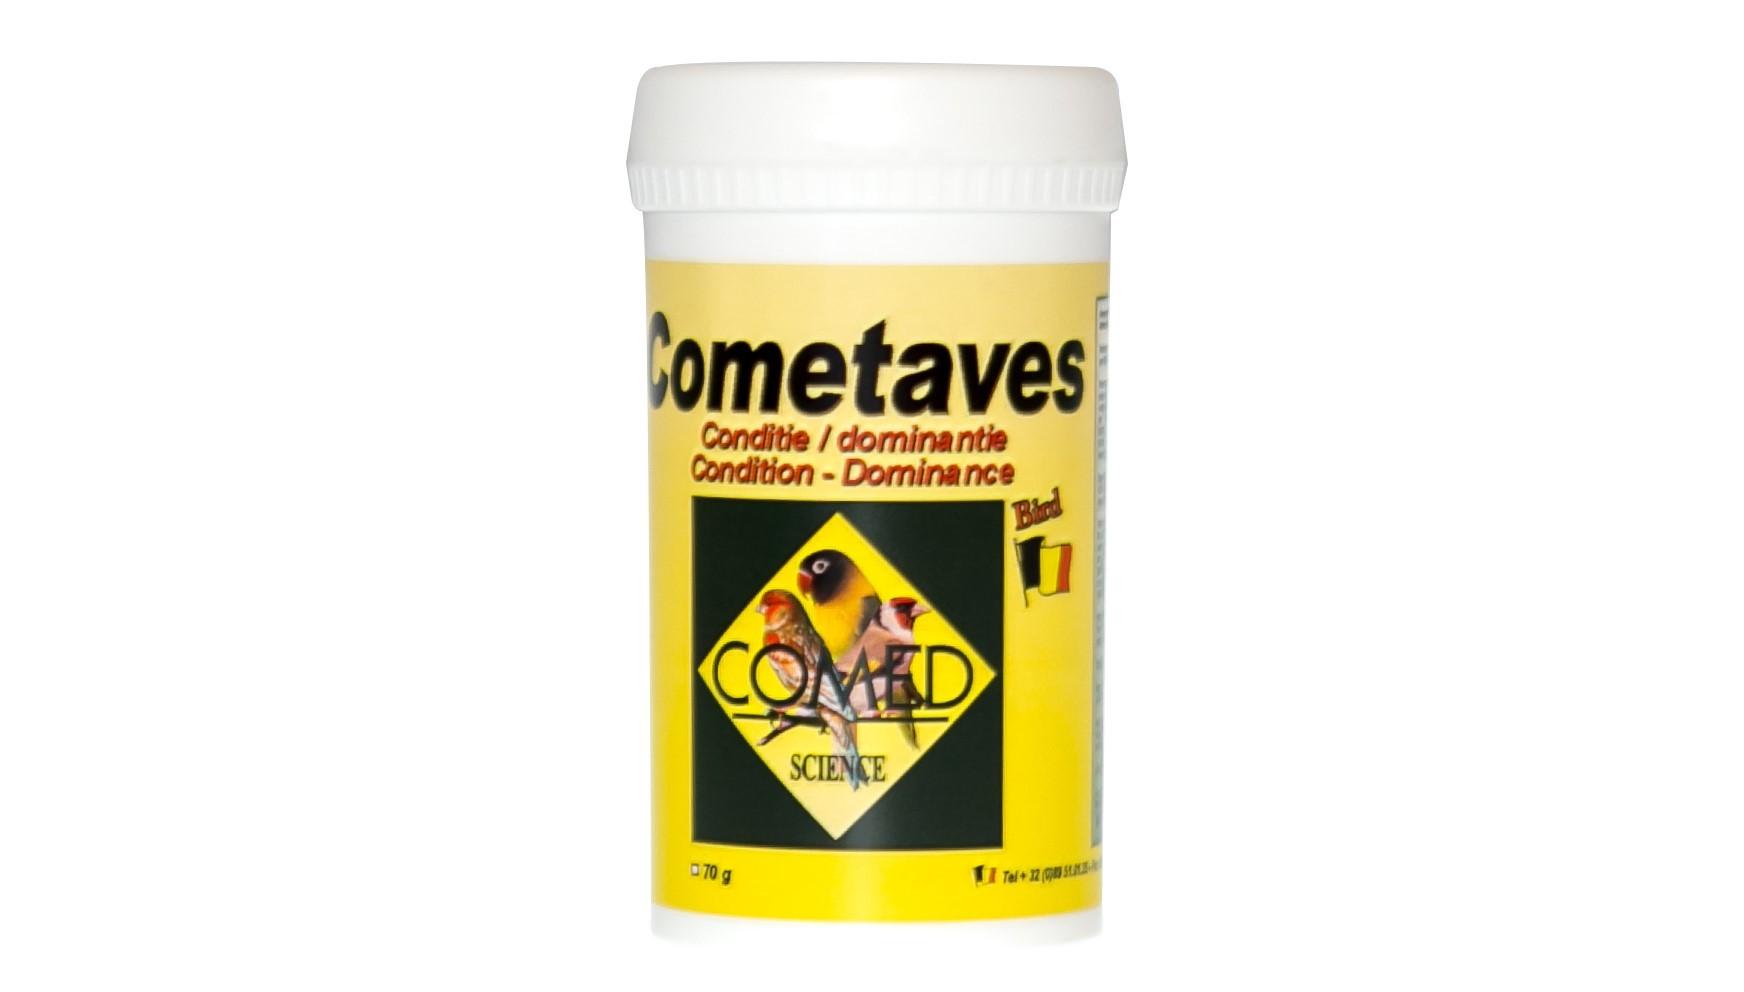 Comed Cometaves 70 gram